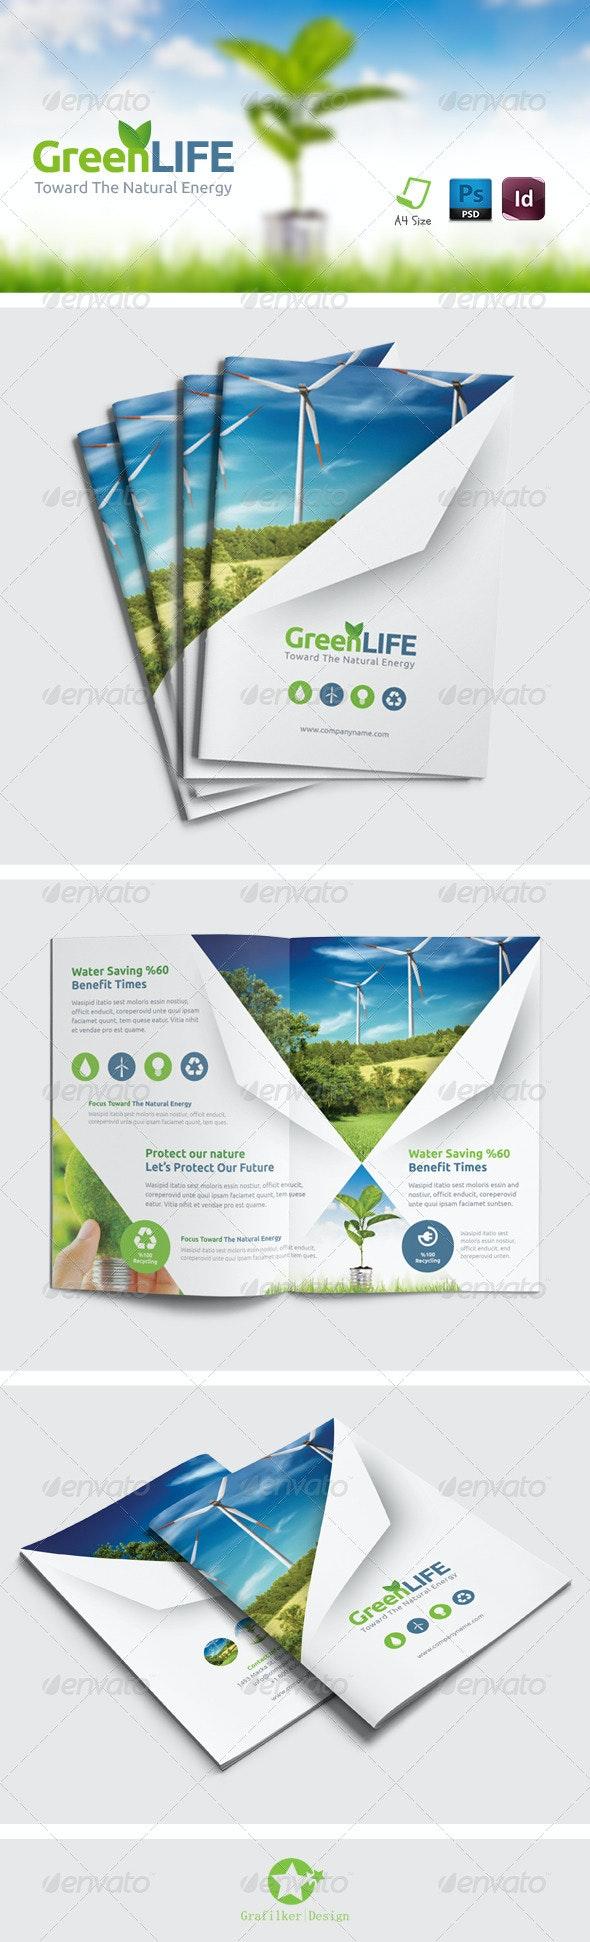 Green Energy Brochure Templates - Brochures Print Templates